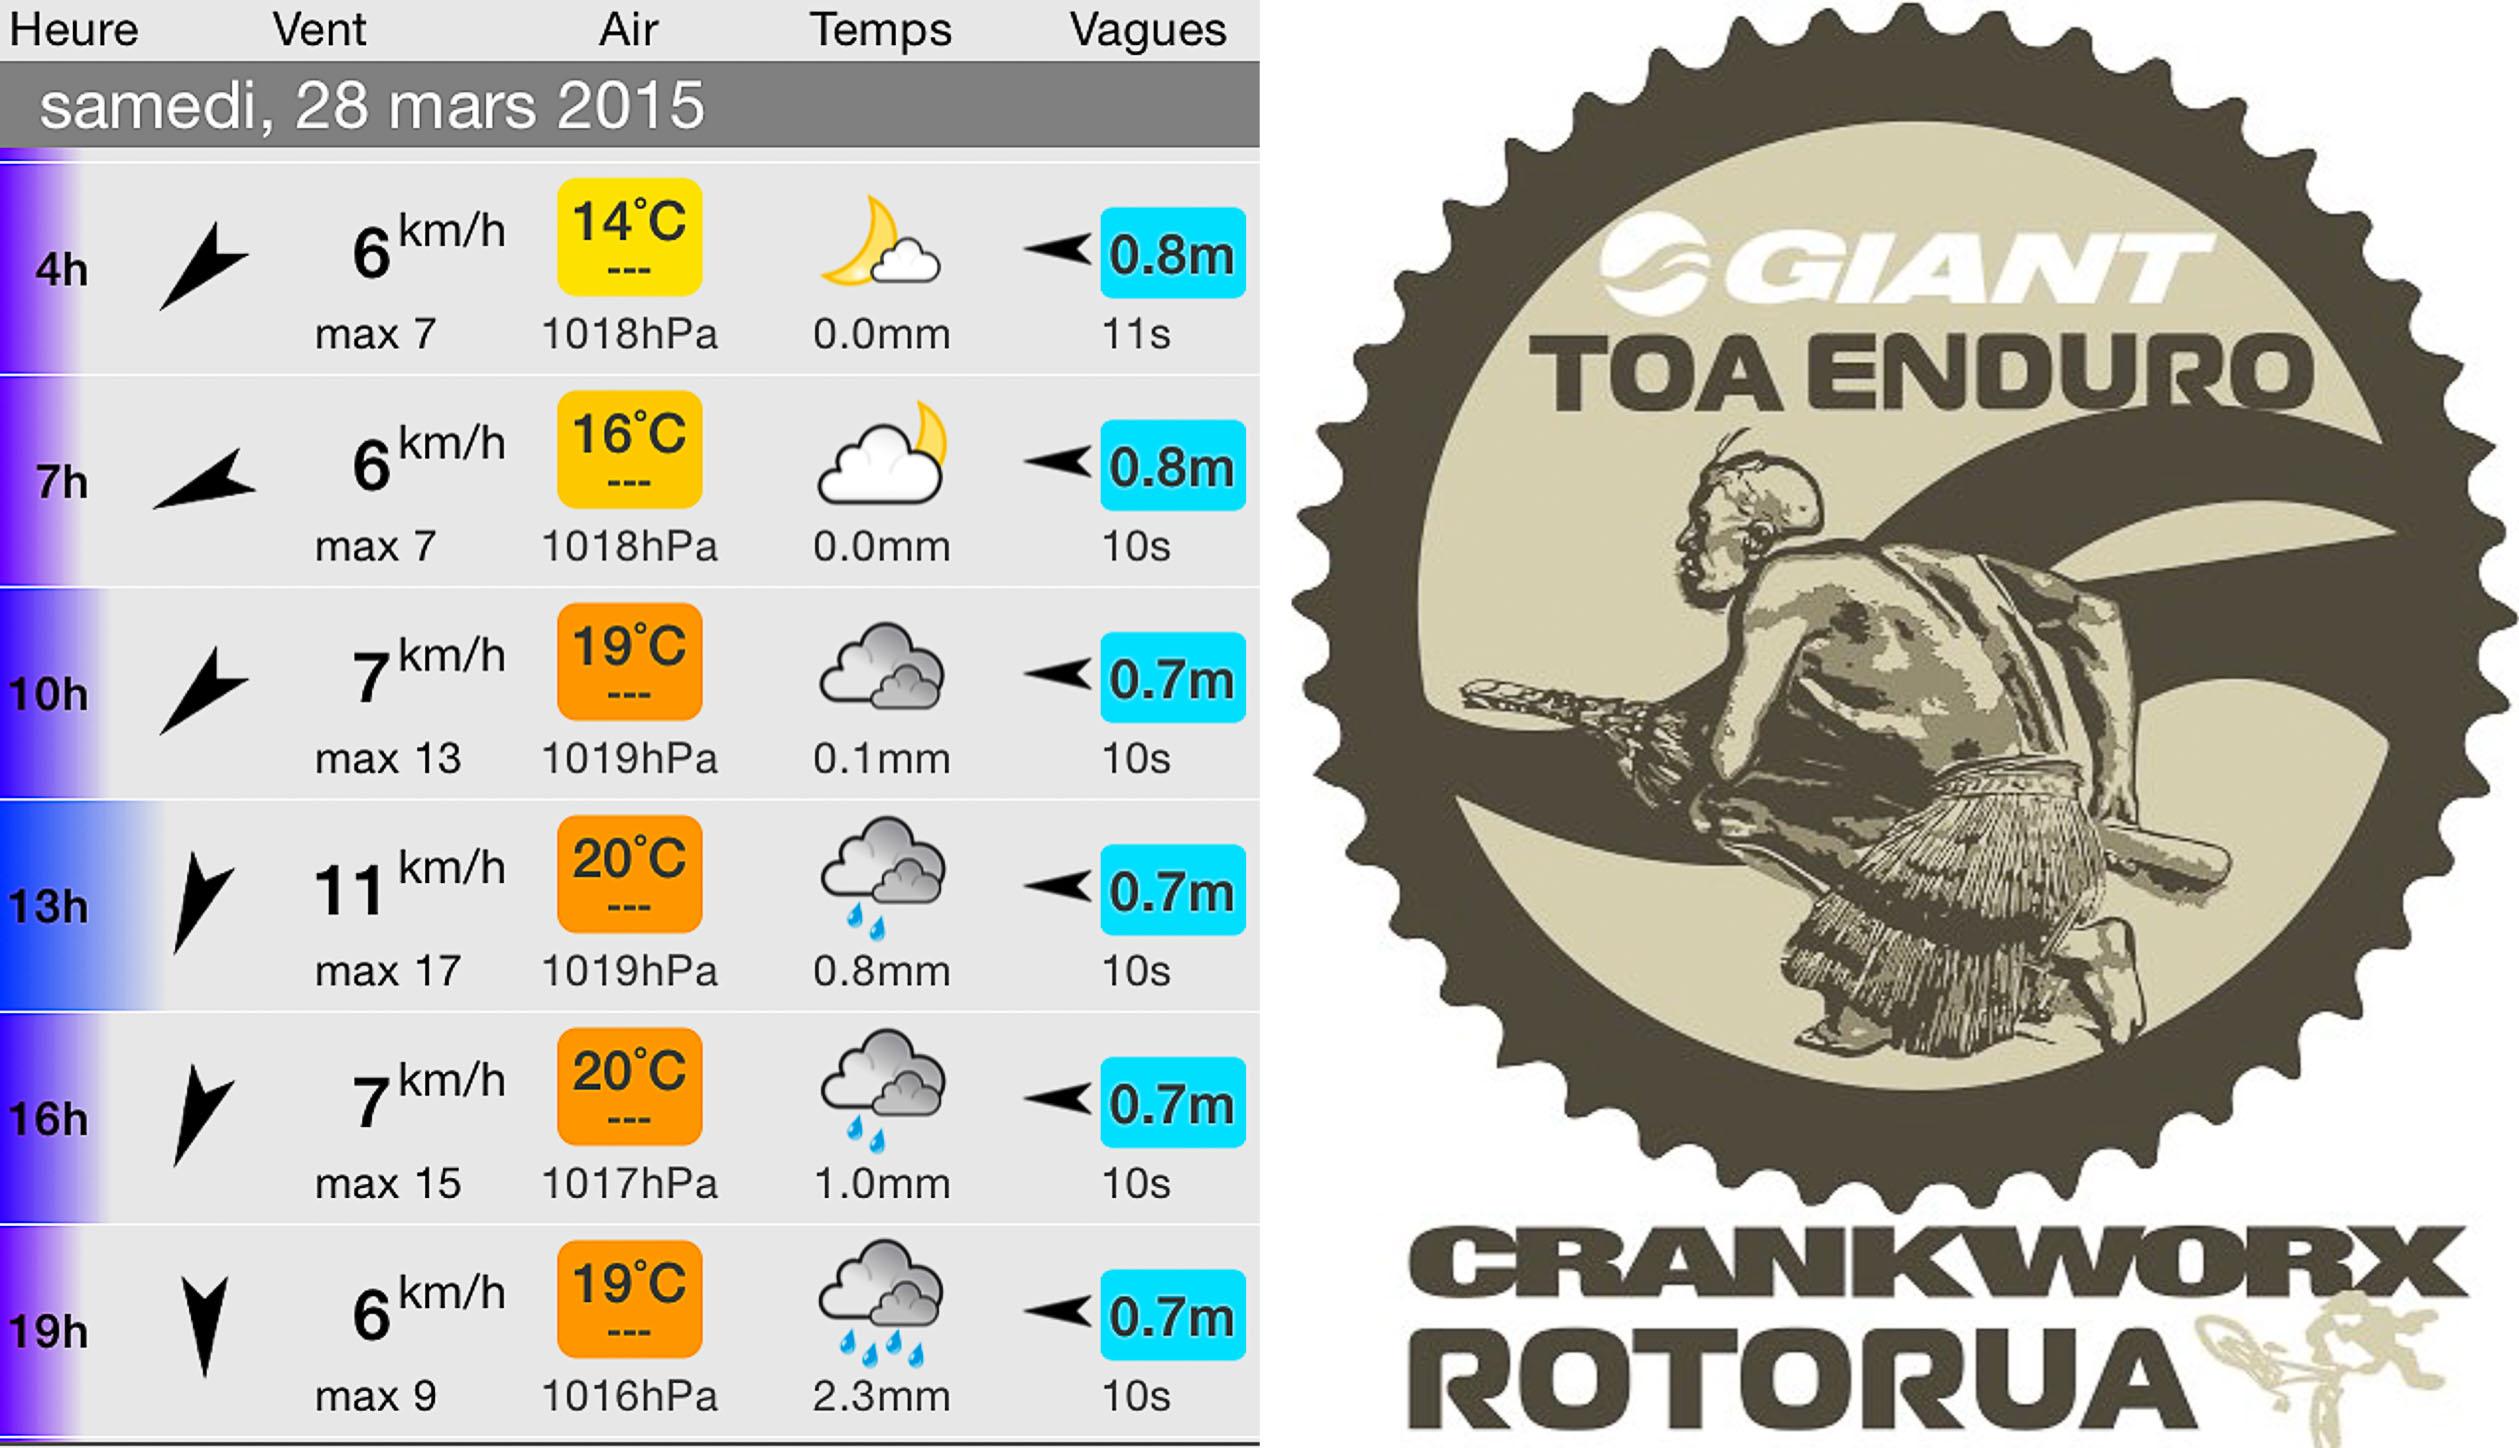 Compo4_EWS_Rotorua_Crankworx